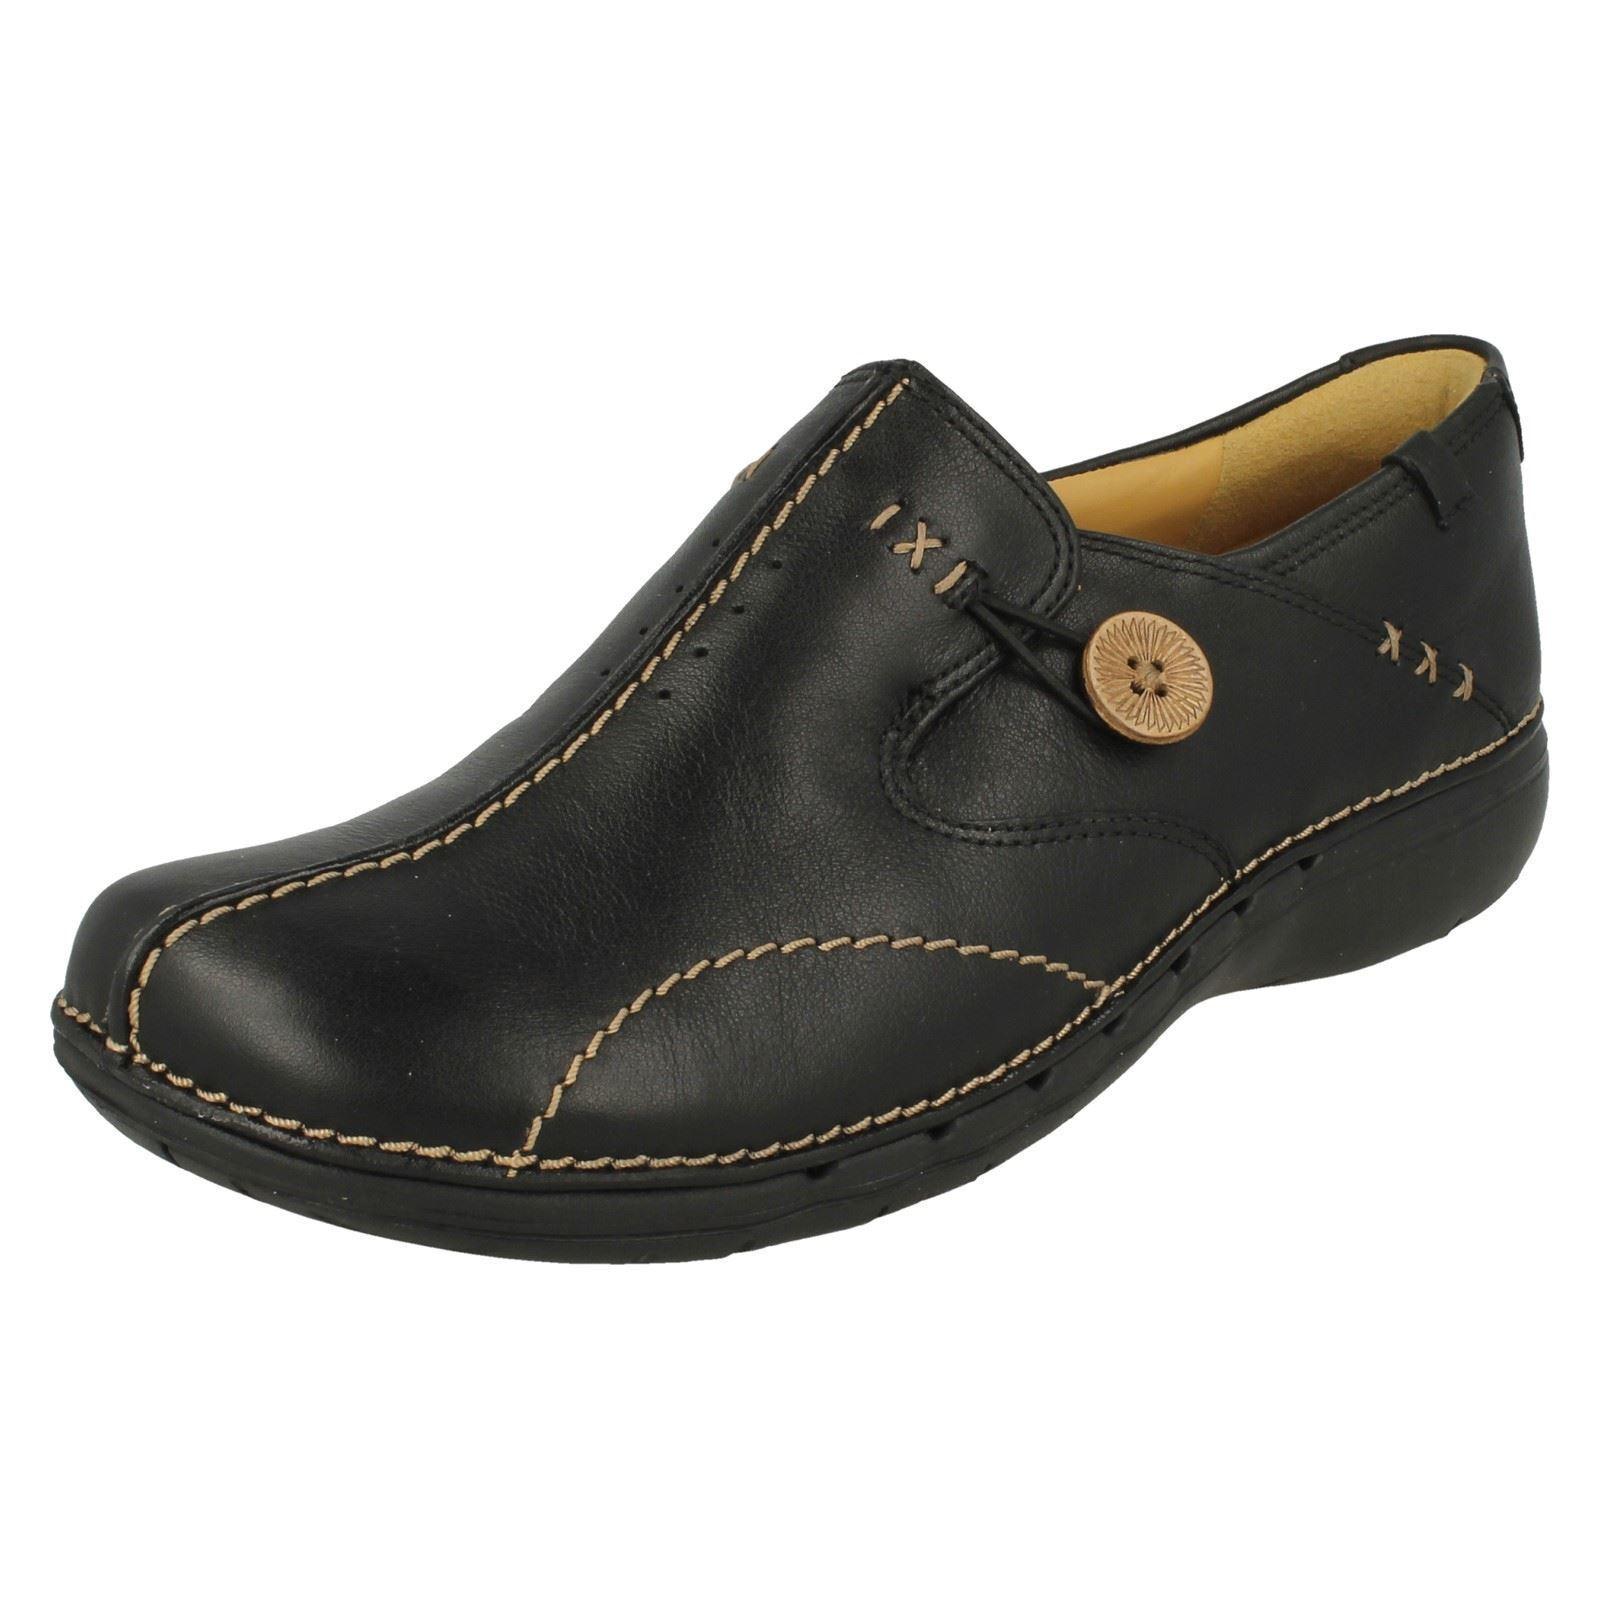 Clarks Ladies Un Loop4 Black Leather Slip On shoes D Fit (R8B)